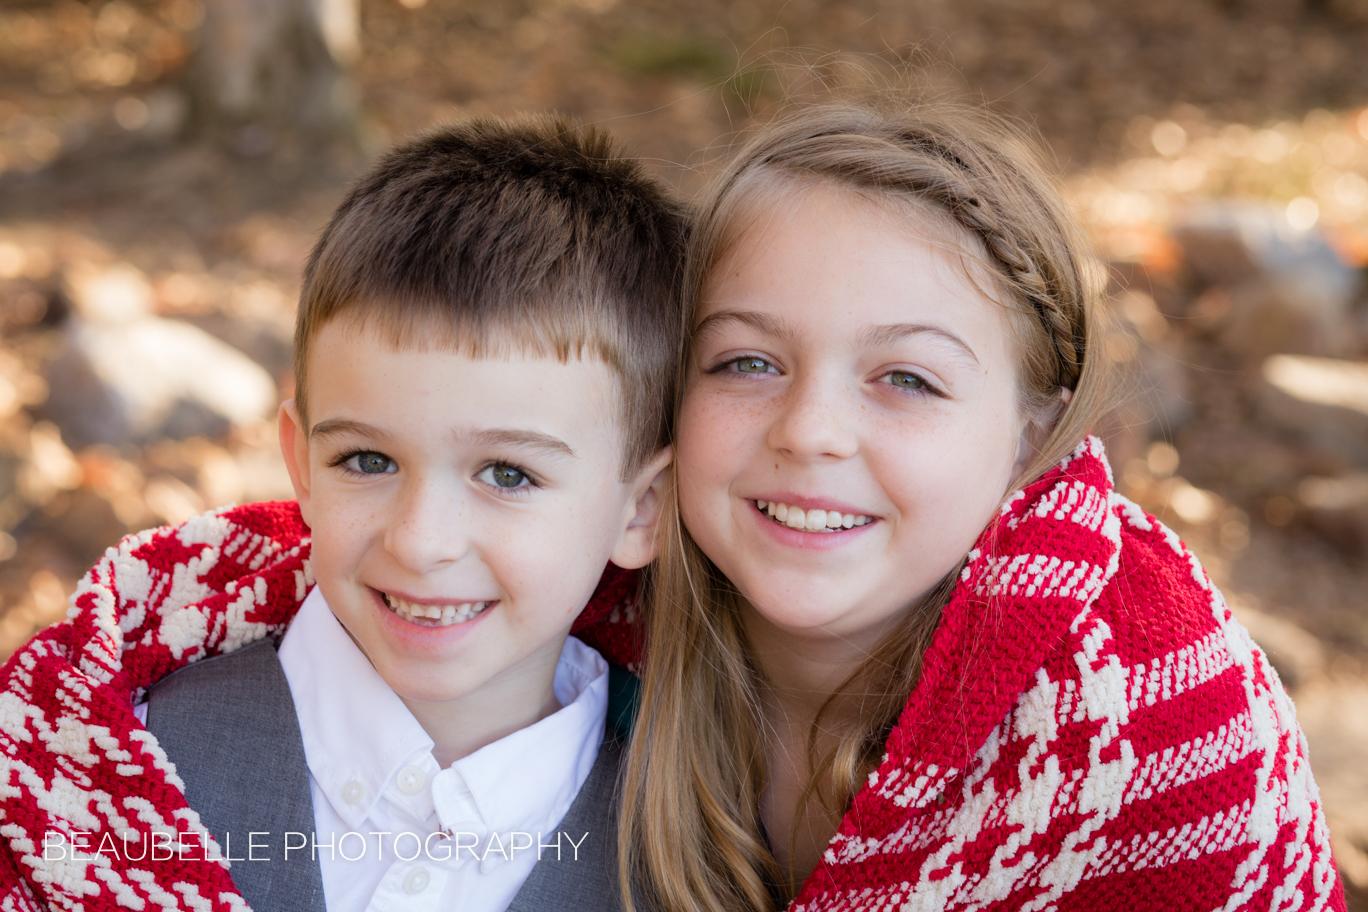 Beaubelle Photography Children